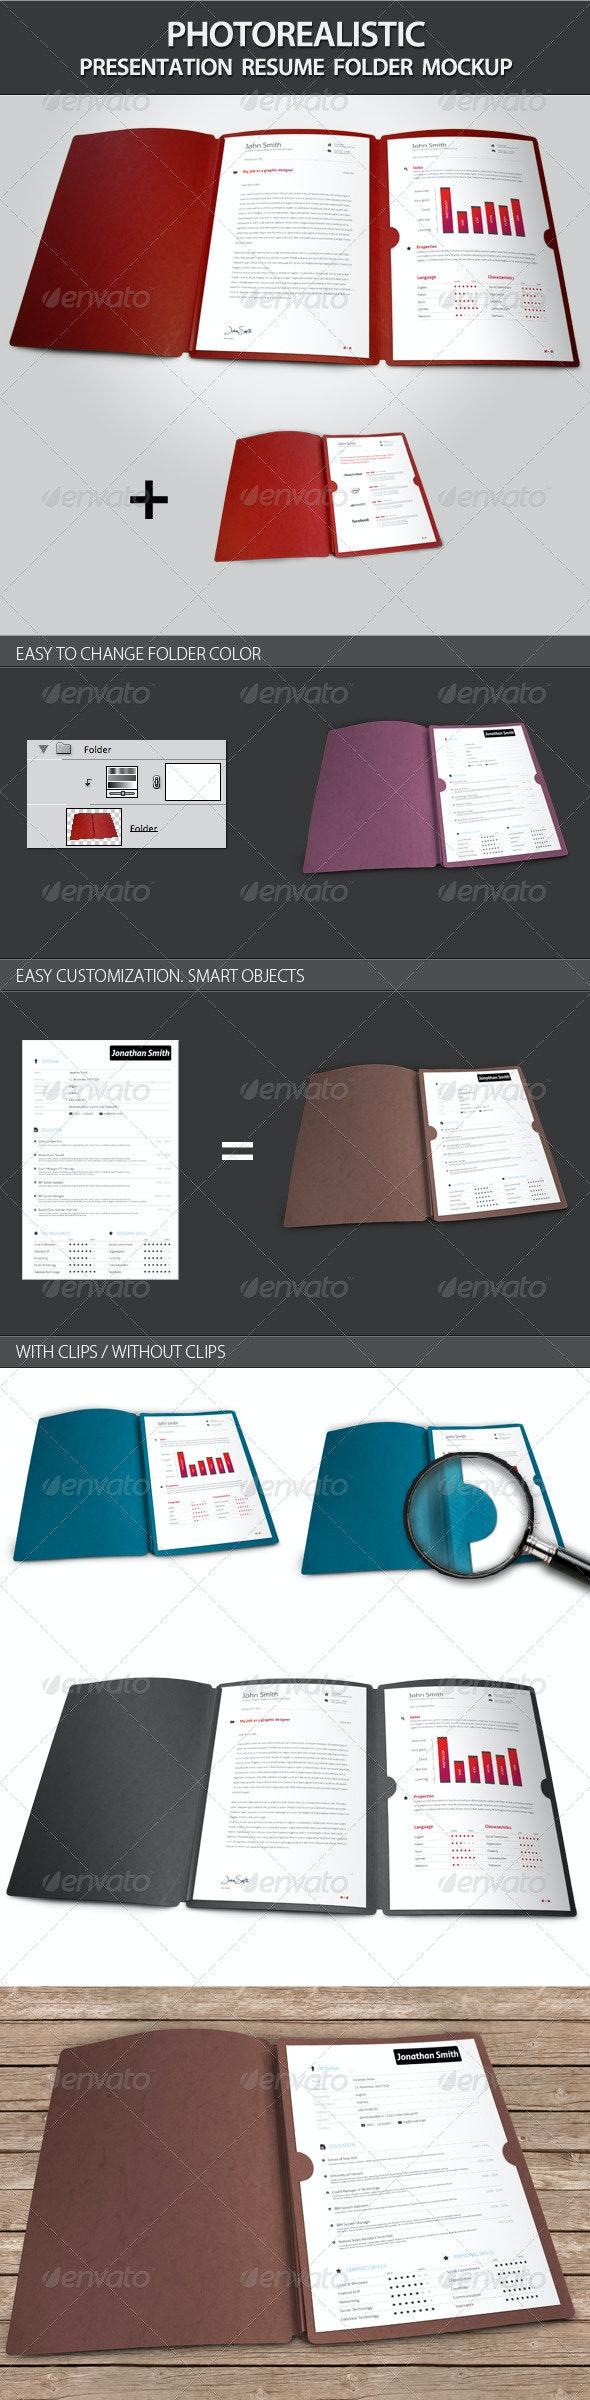 Photorealistic Presentation Resume Folder Mockup - Miscellaneous Print